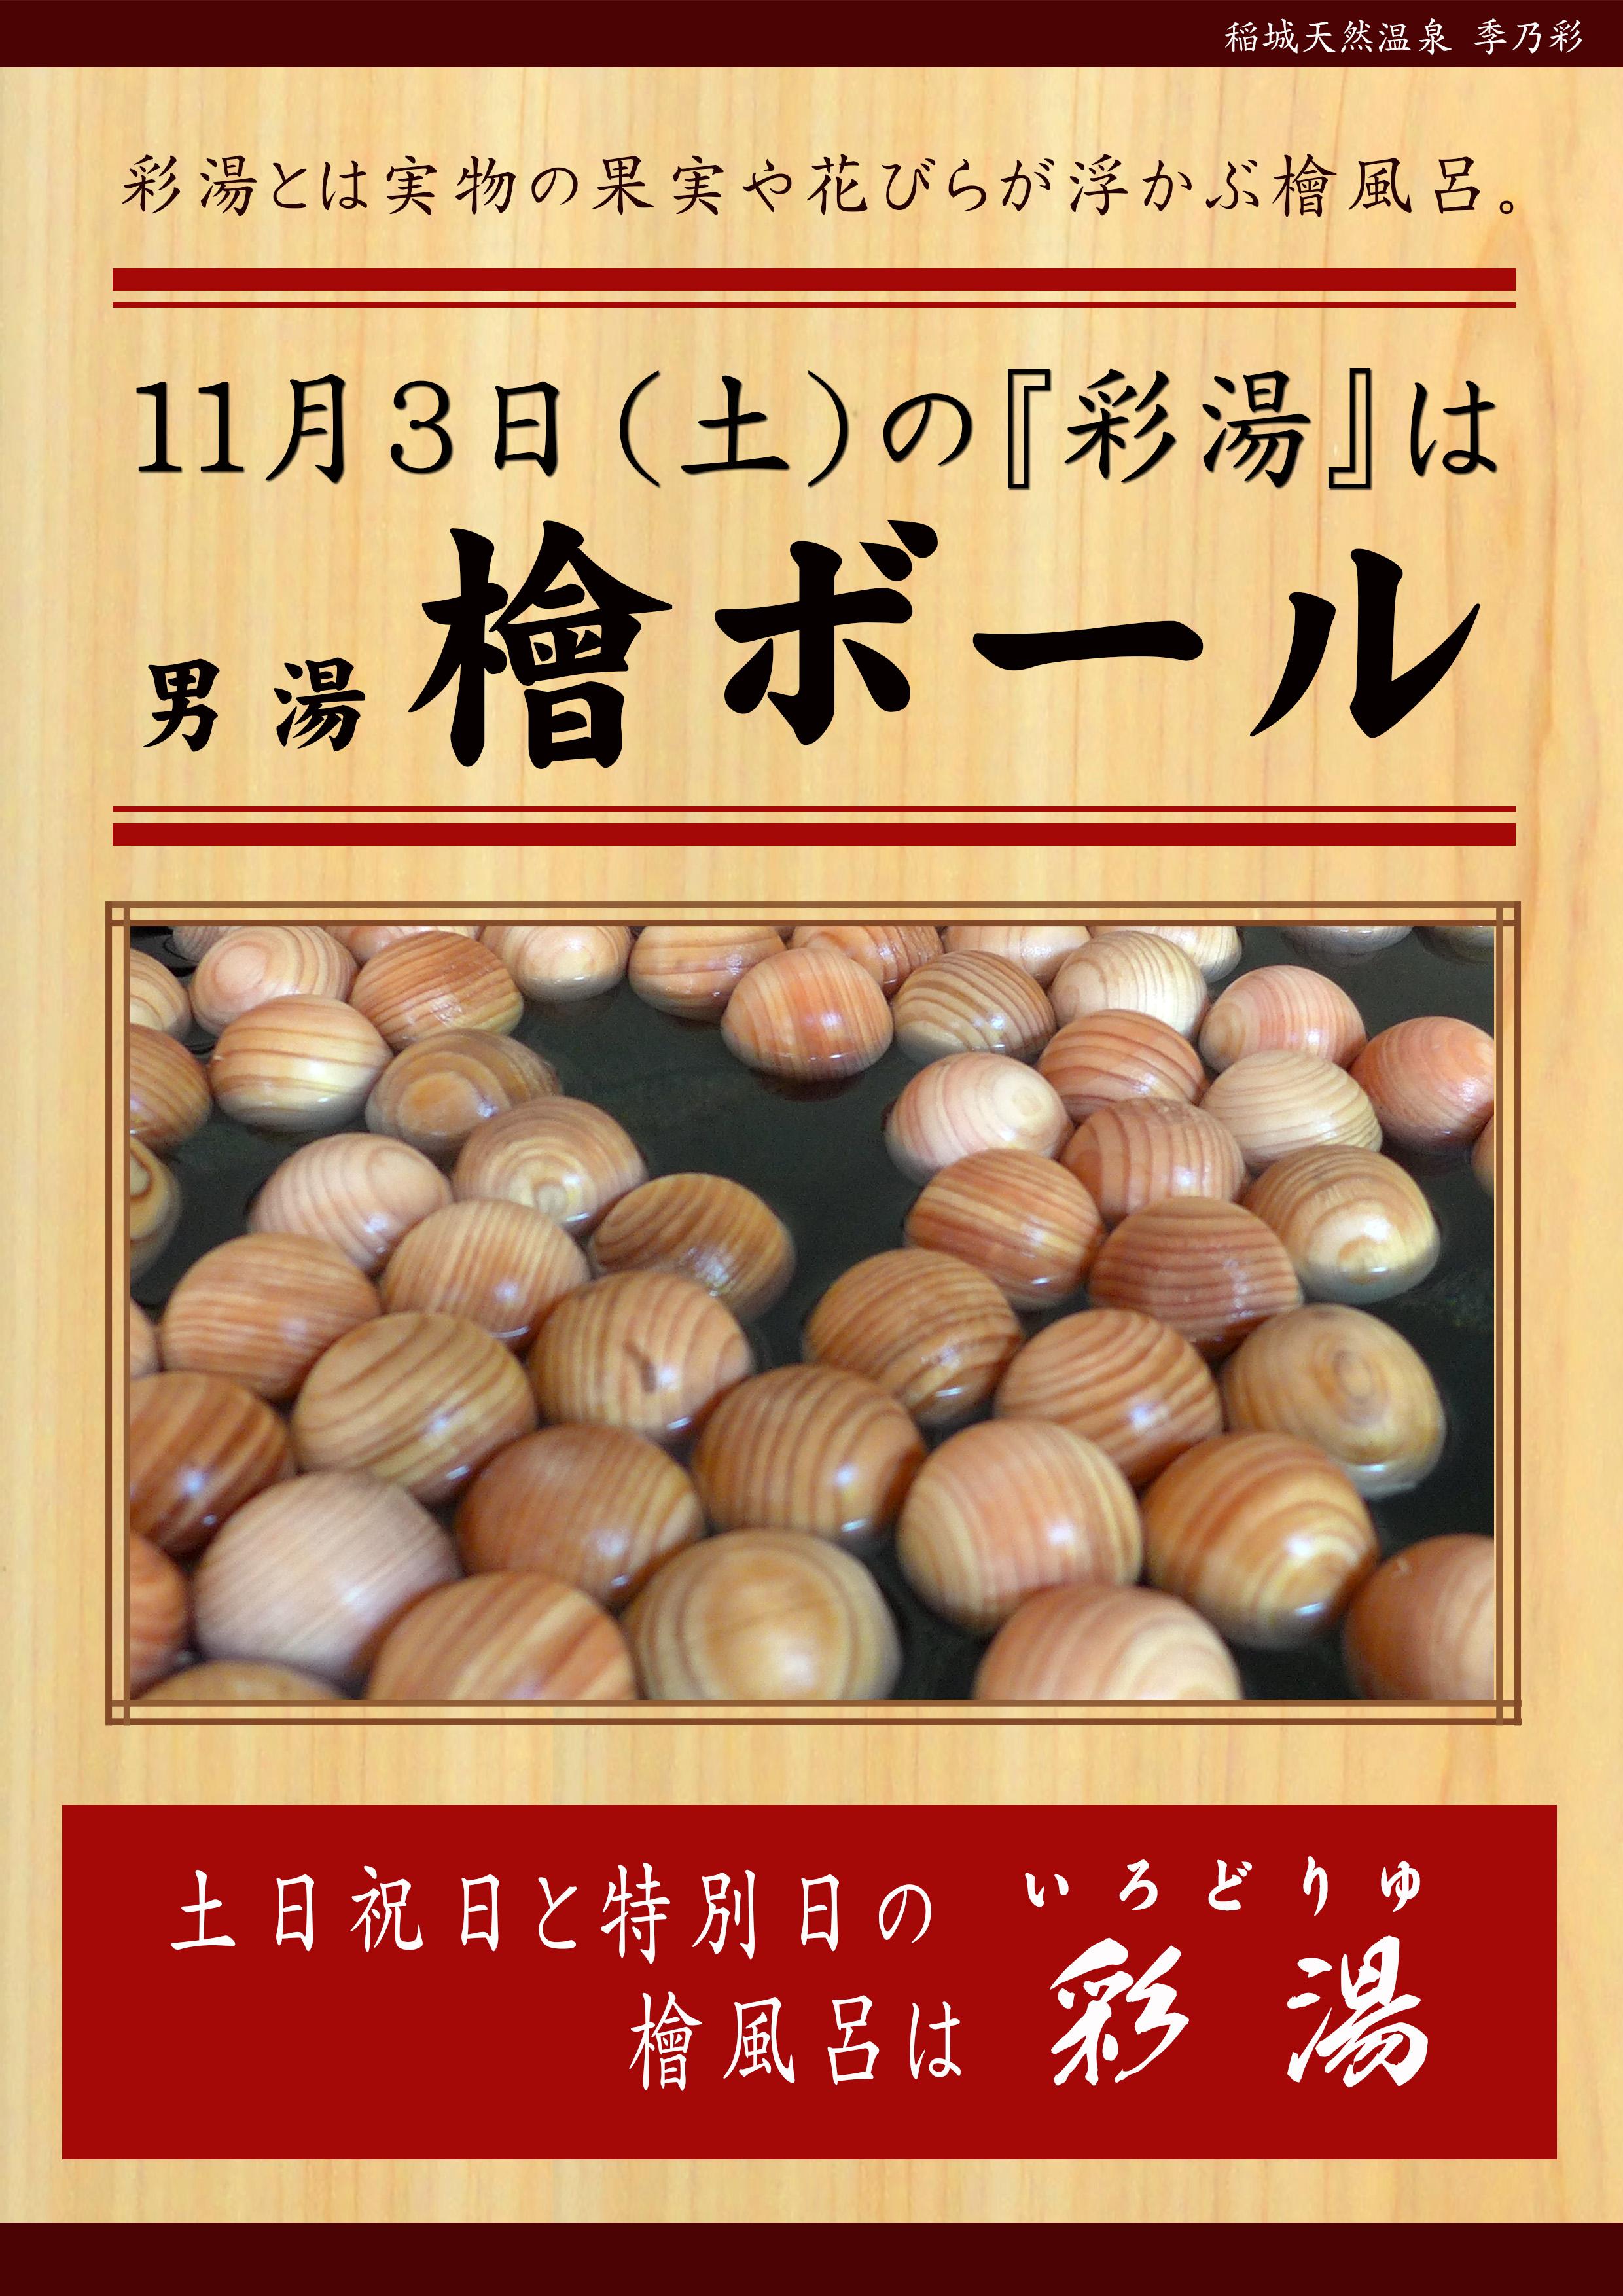 20181103POP イベント 彩湯 男湯 檜ボール